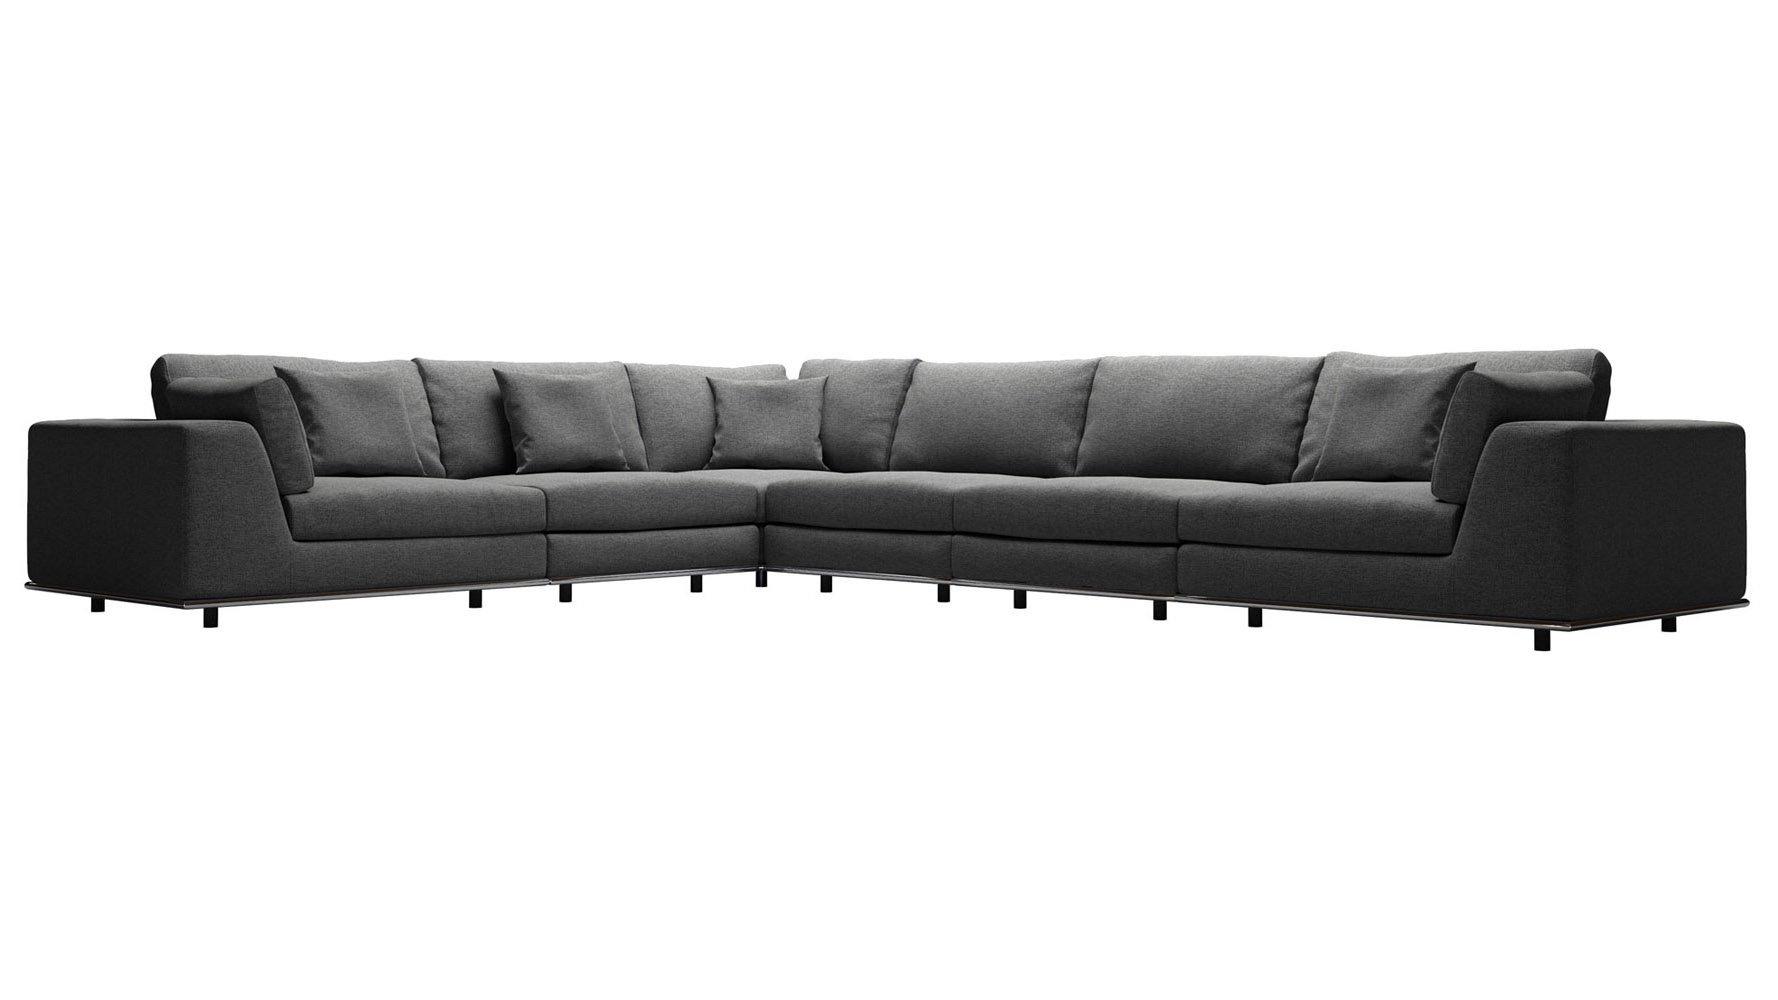 Modern Persis Extra Seating L Sectional Sofa | Zuri Furniture